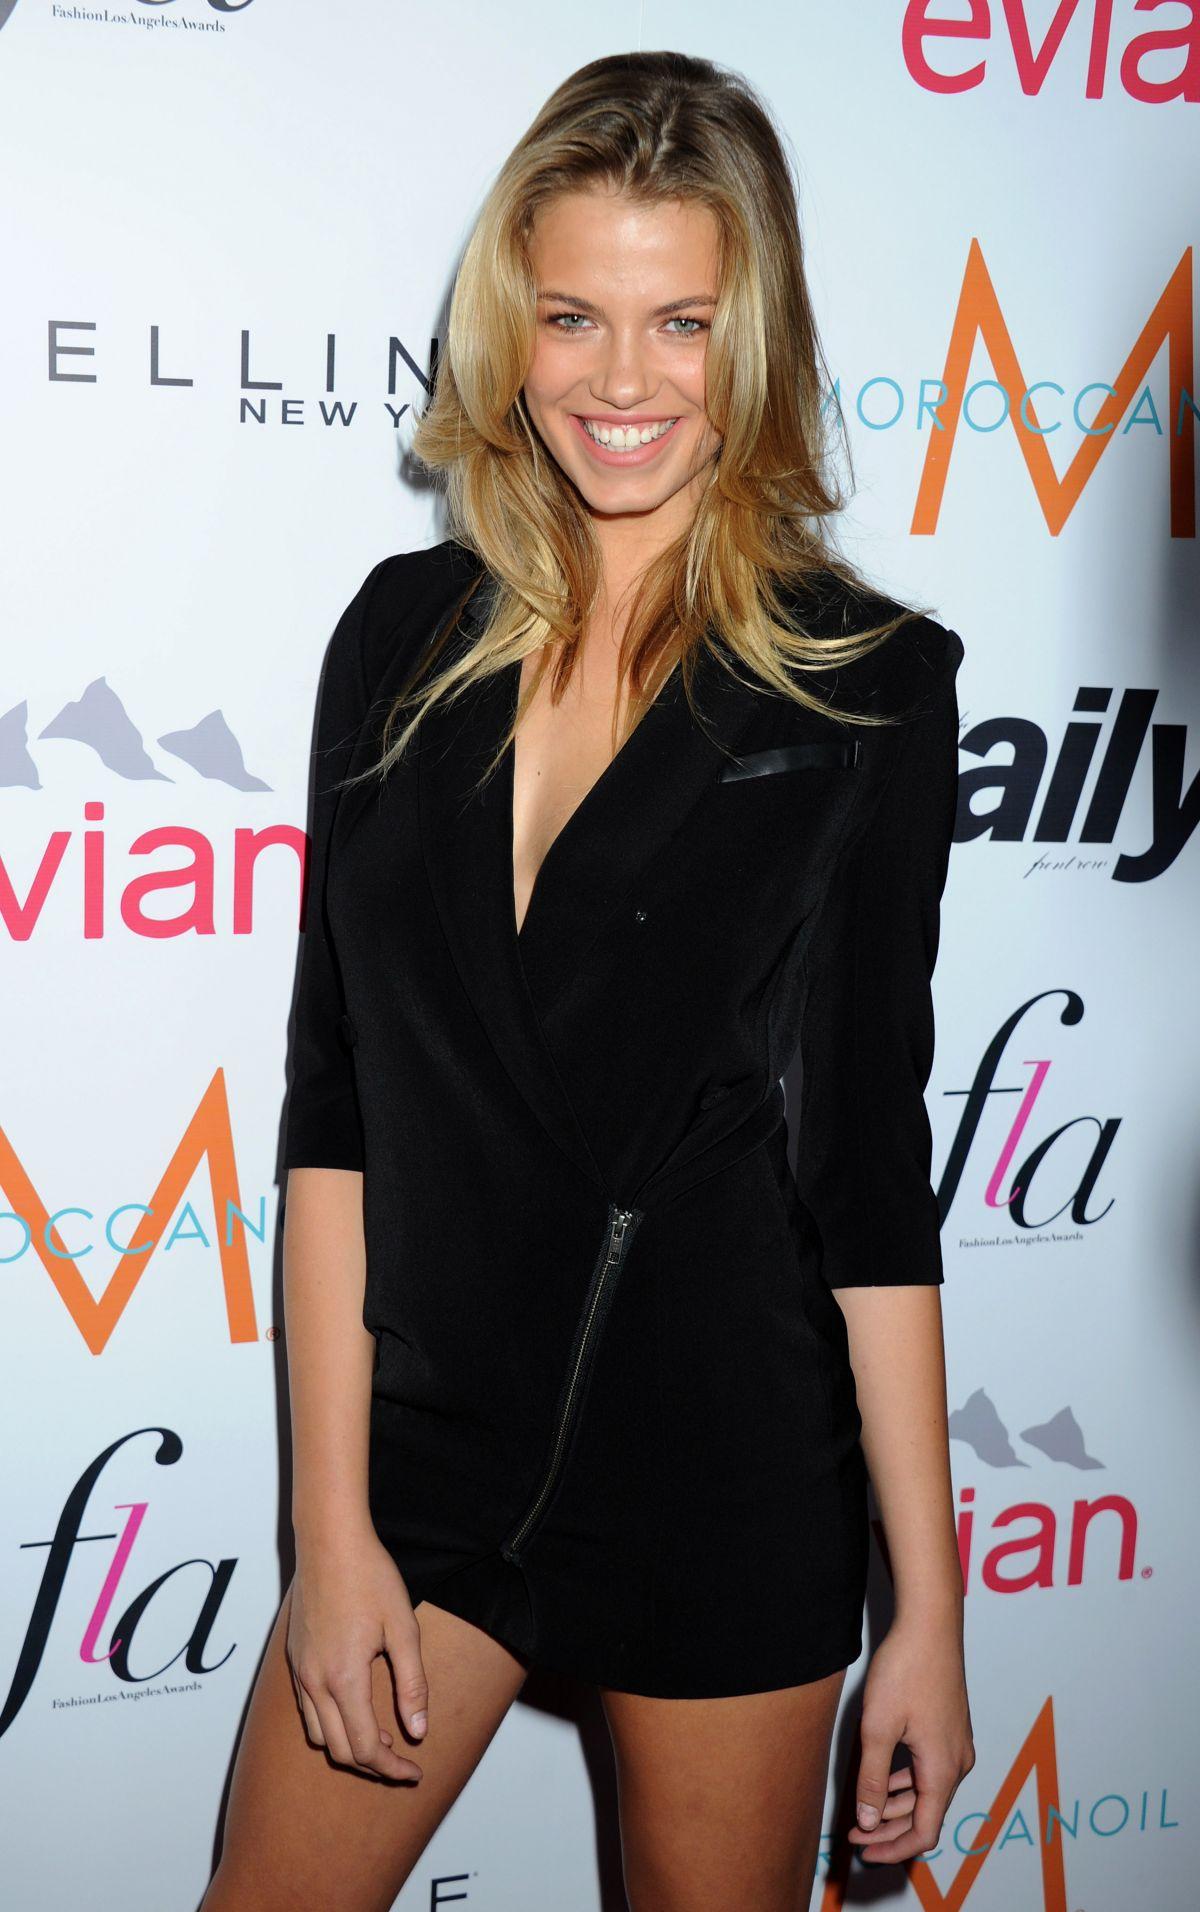 HAILEY CLAUSON at Daily Front Row Fashion Los Angeles Awards Show